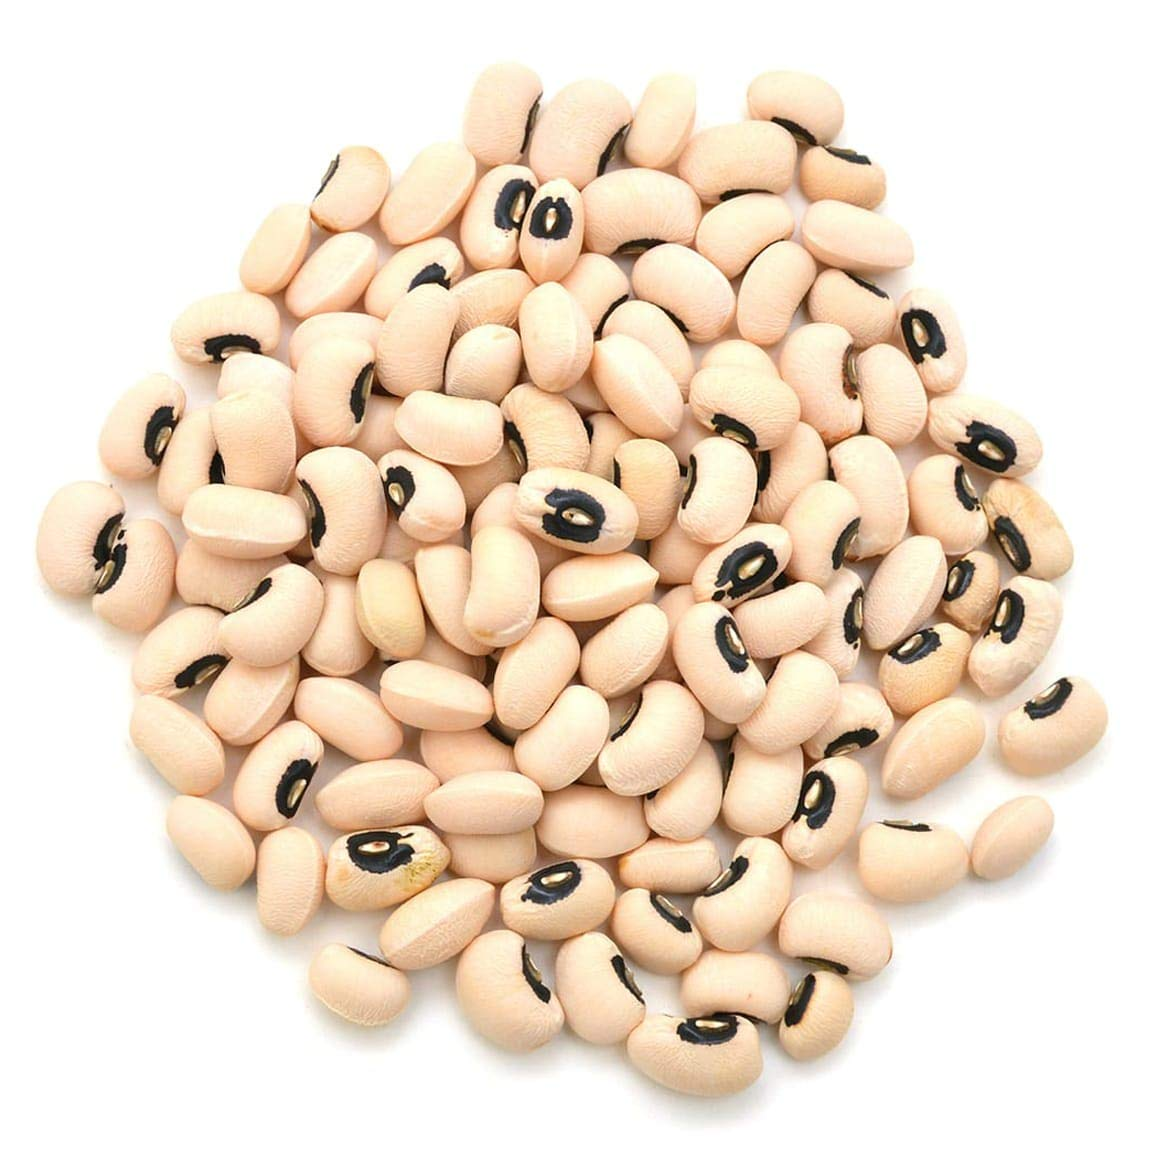 Black Eyed Beans 25 Pounds Kosher